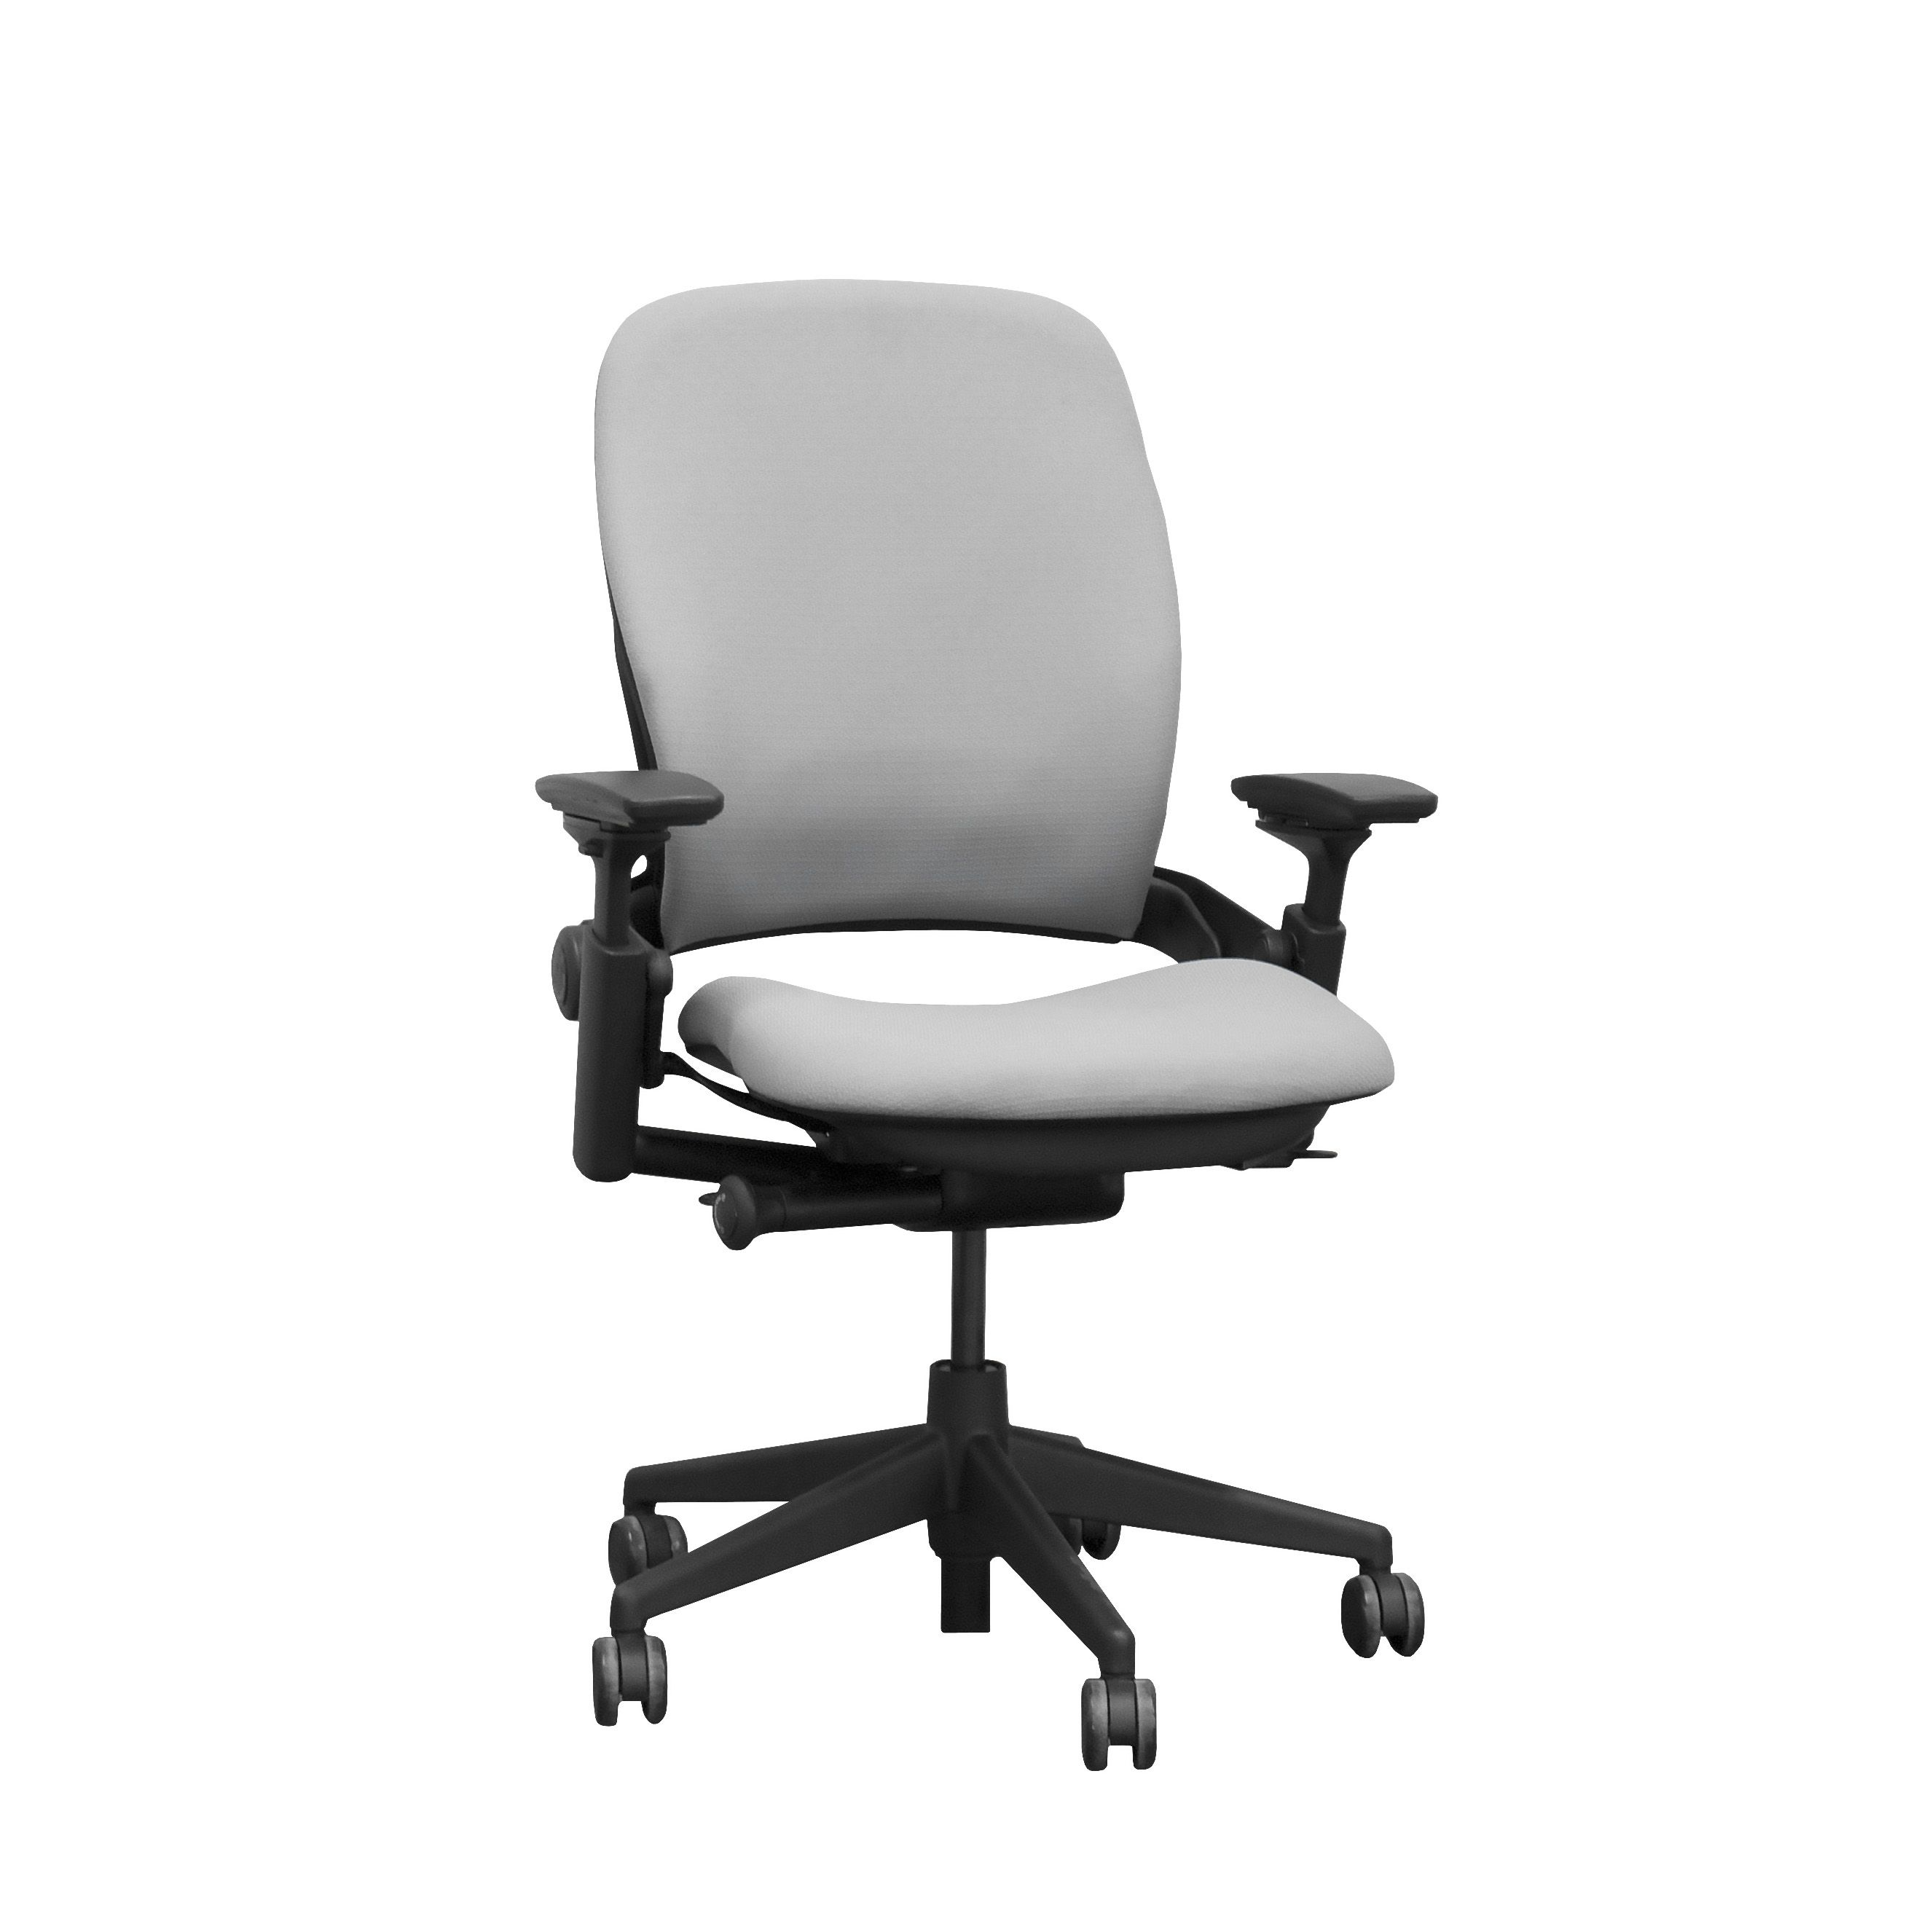 Steelcase Leap V2 Ergonomic seating, Ergonomic chair